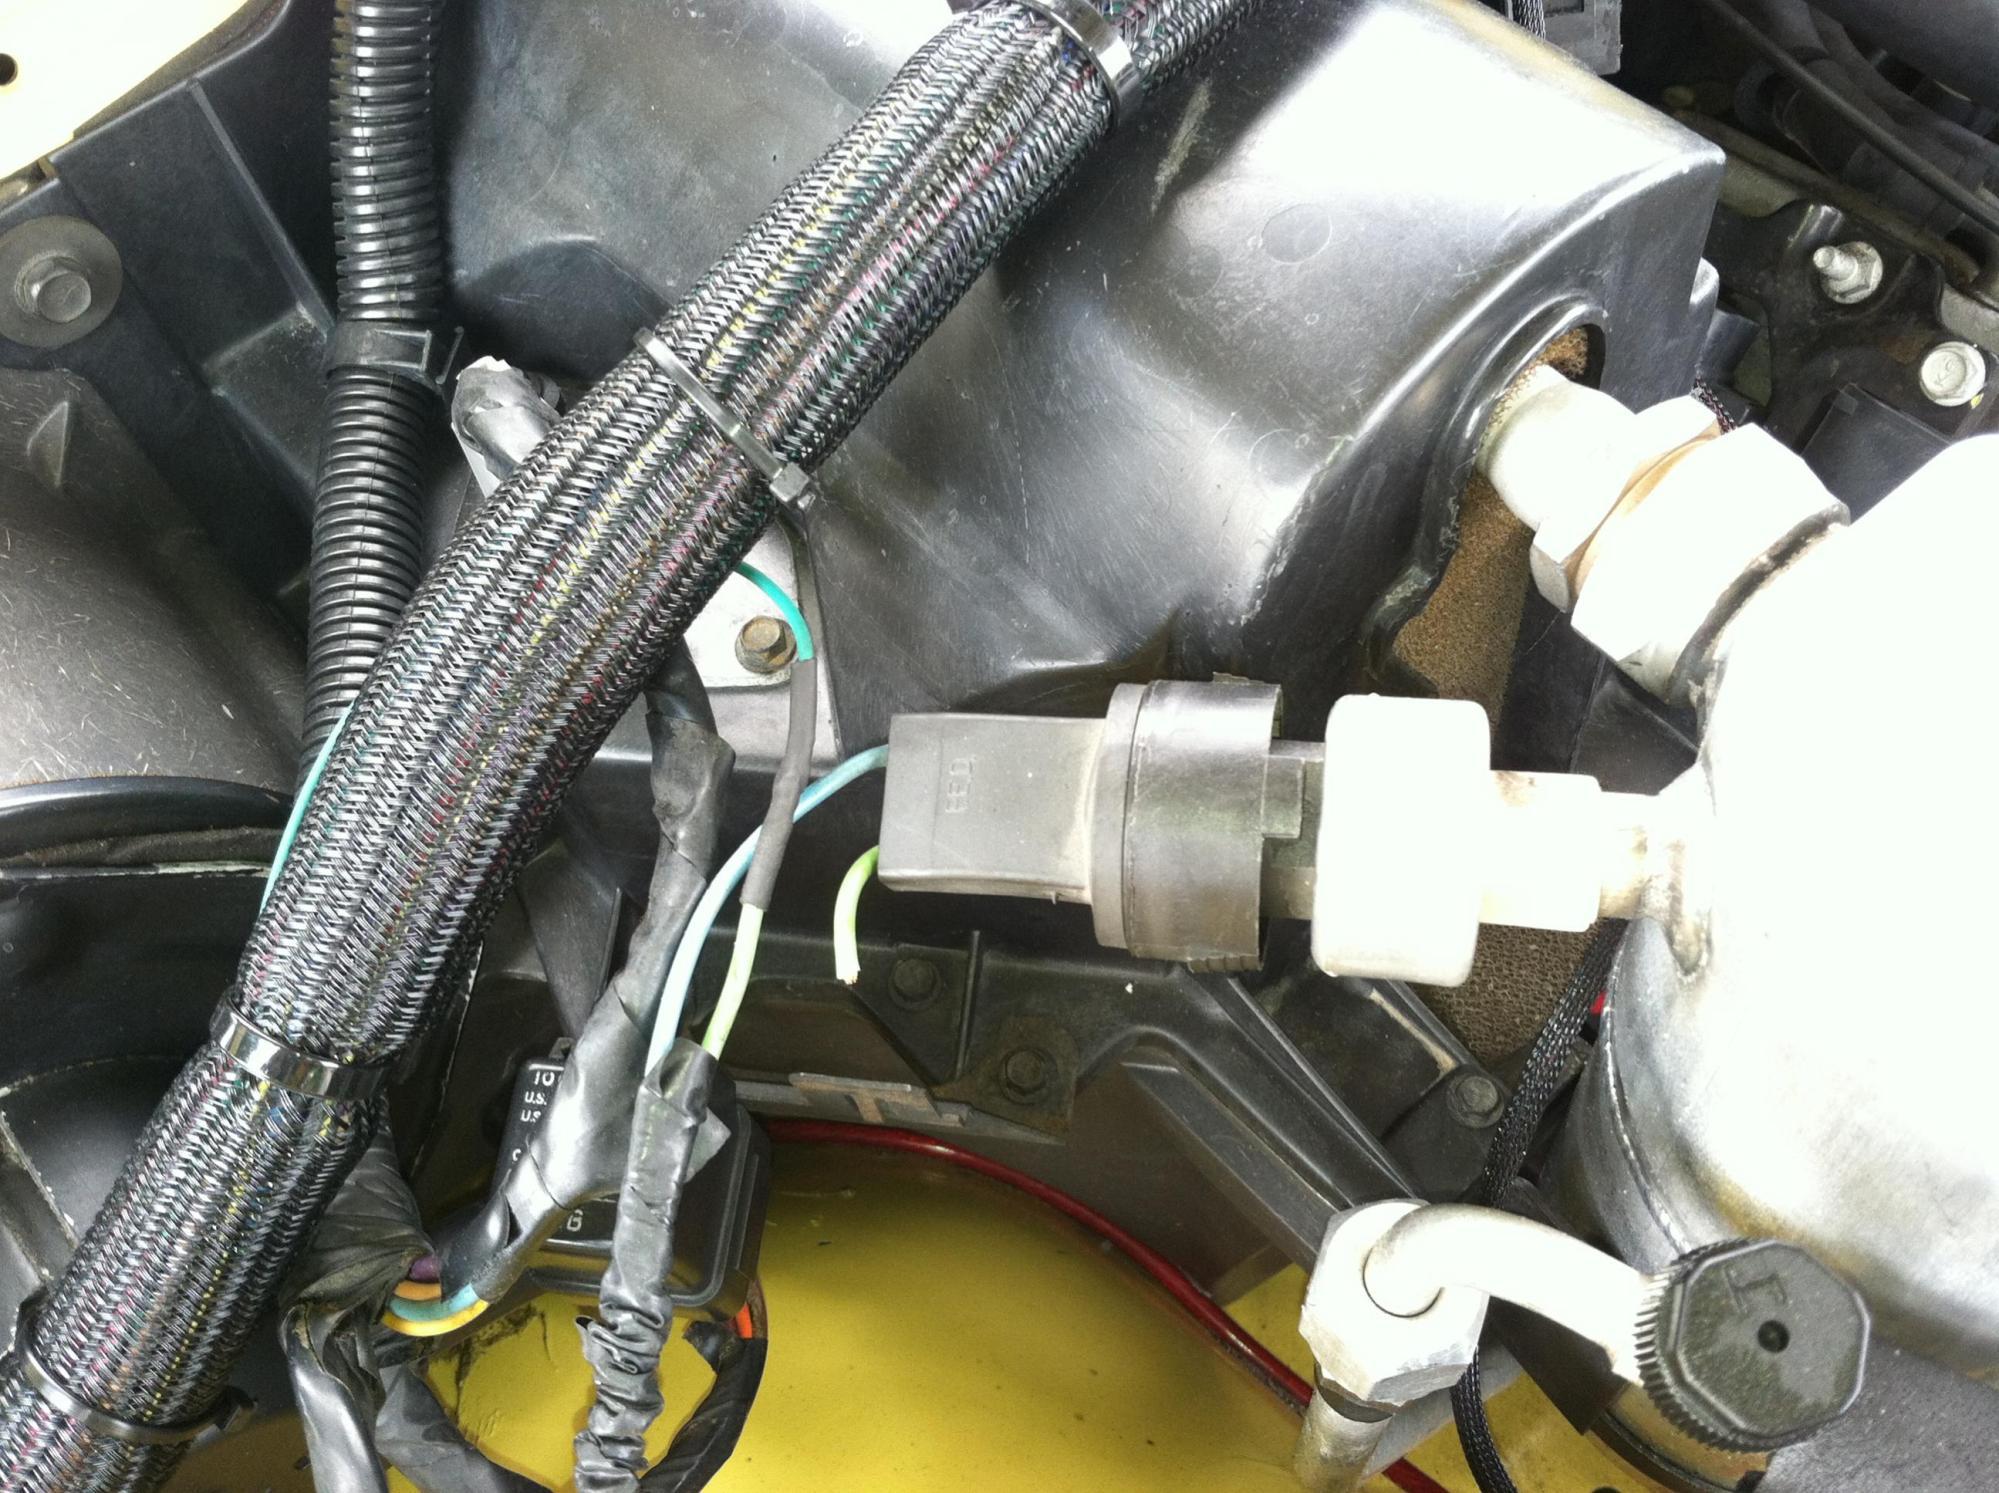 hight resolution of  hvac blower wiring on ls1 swap and hawks harness img 0551 jpg